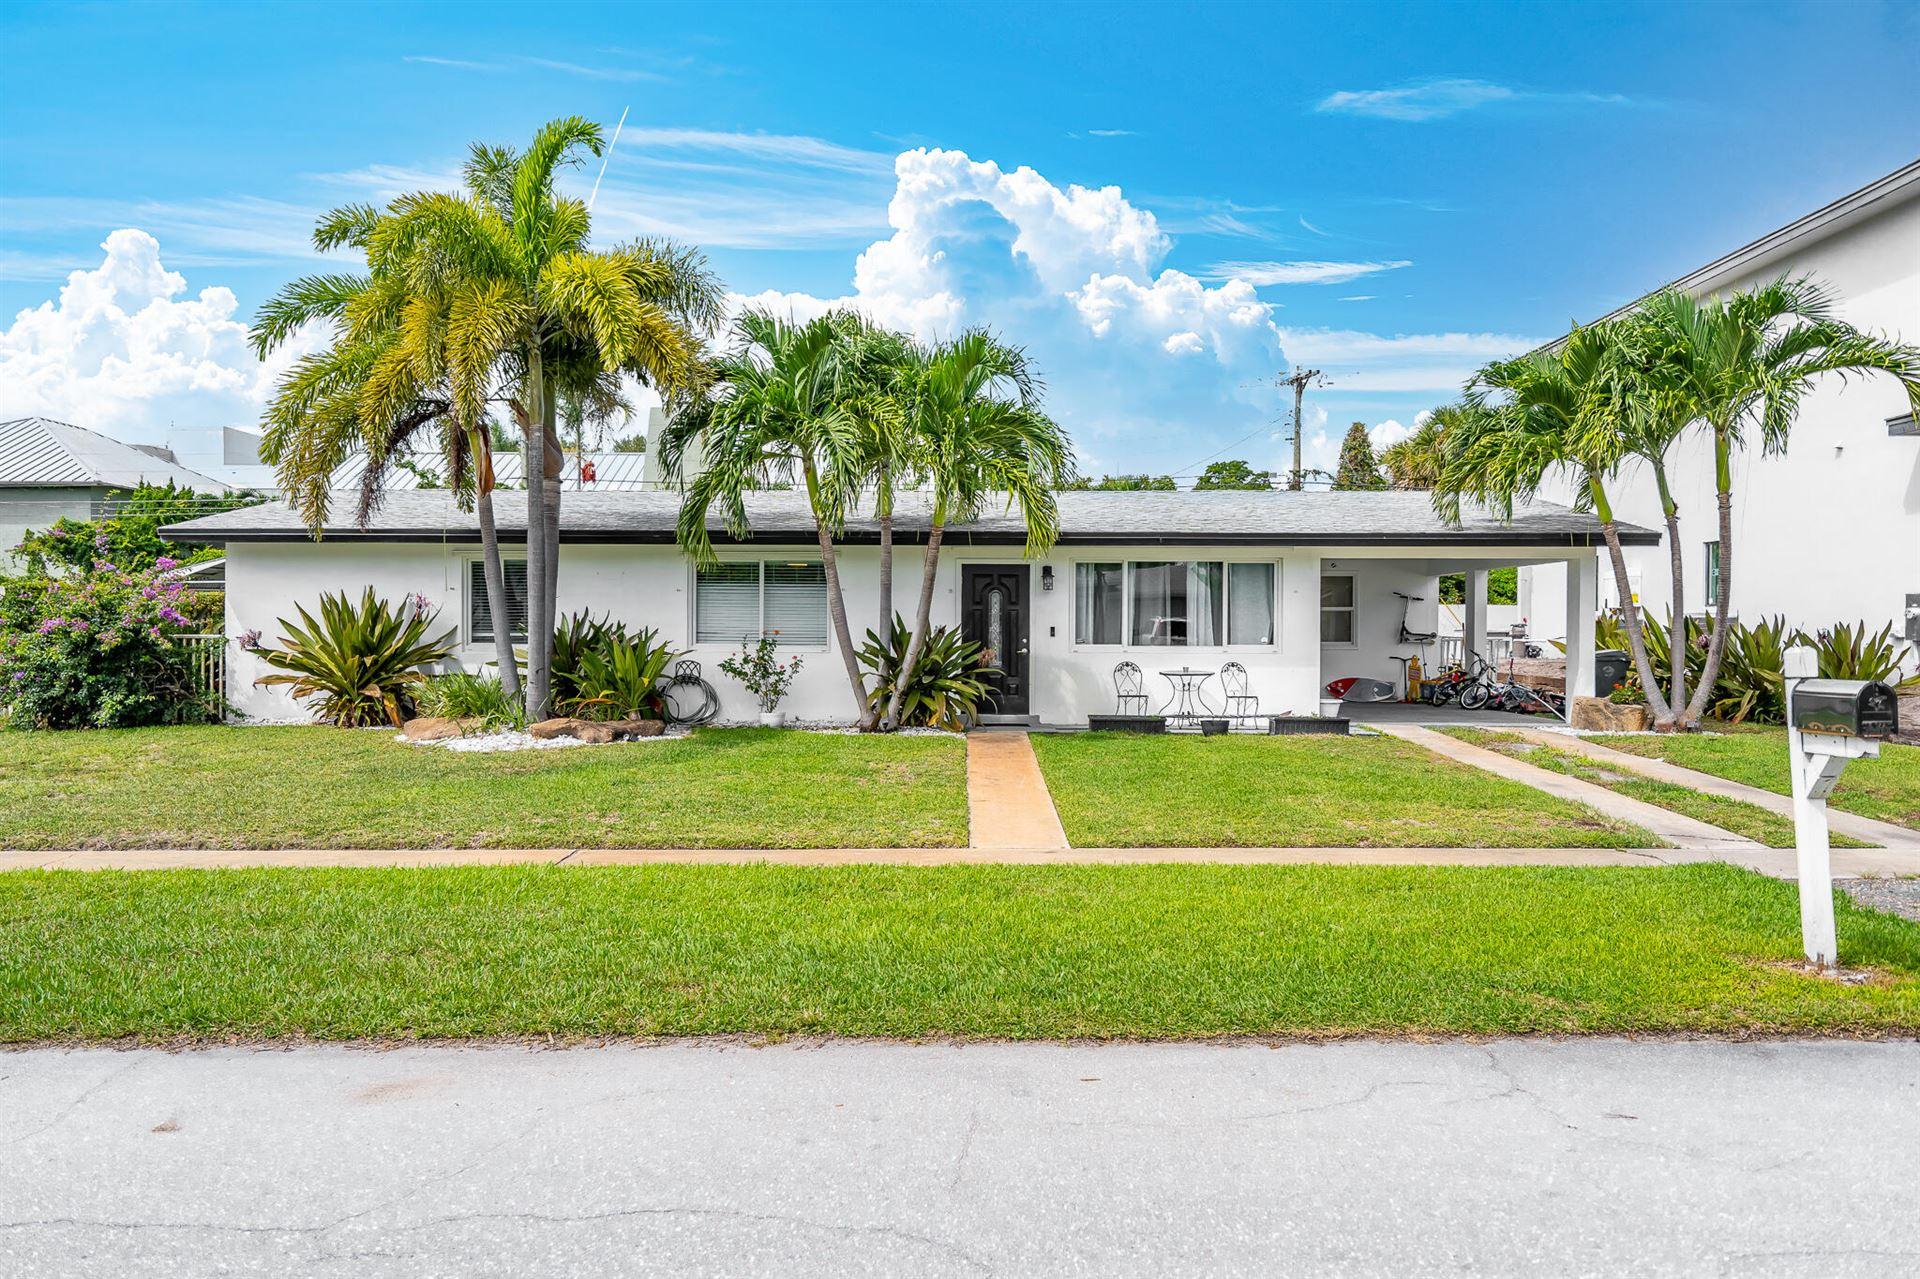 1071 NE 2nd Terrace, Boca Raton, FL 33432 - MLS#: RX-10748798